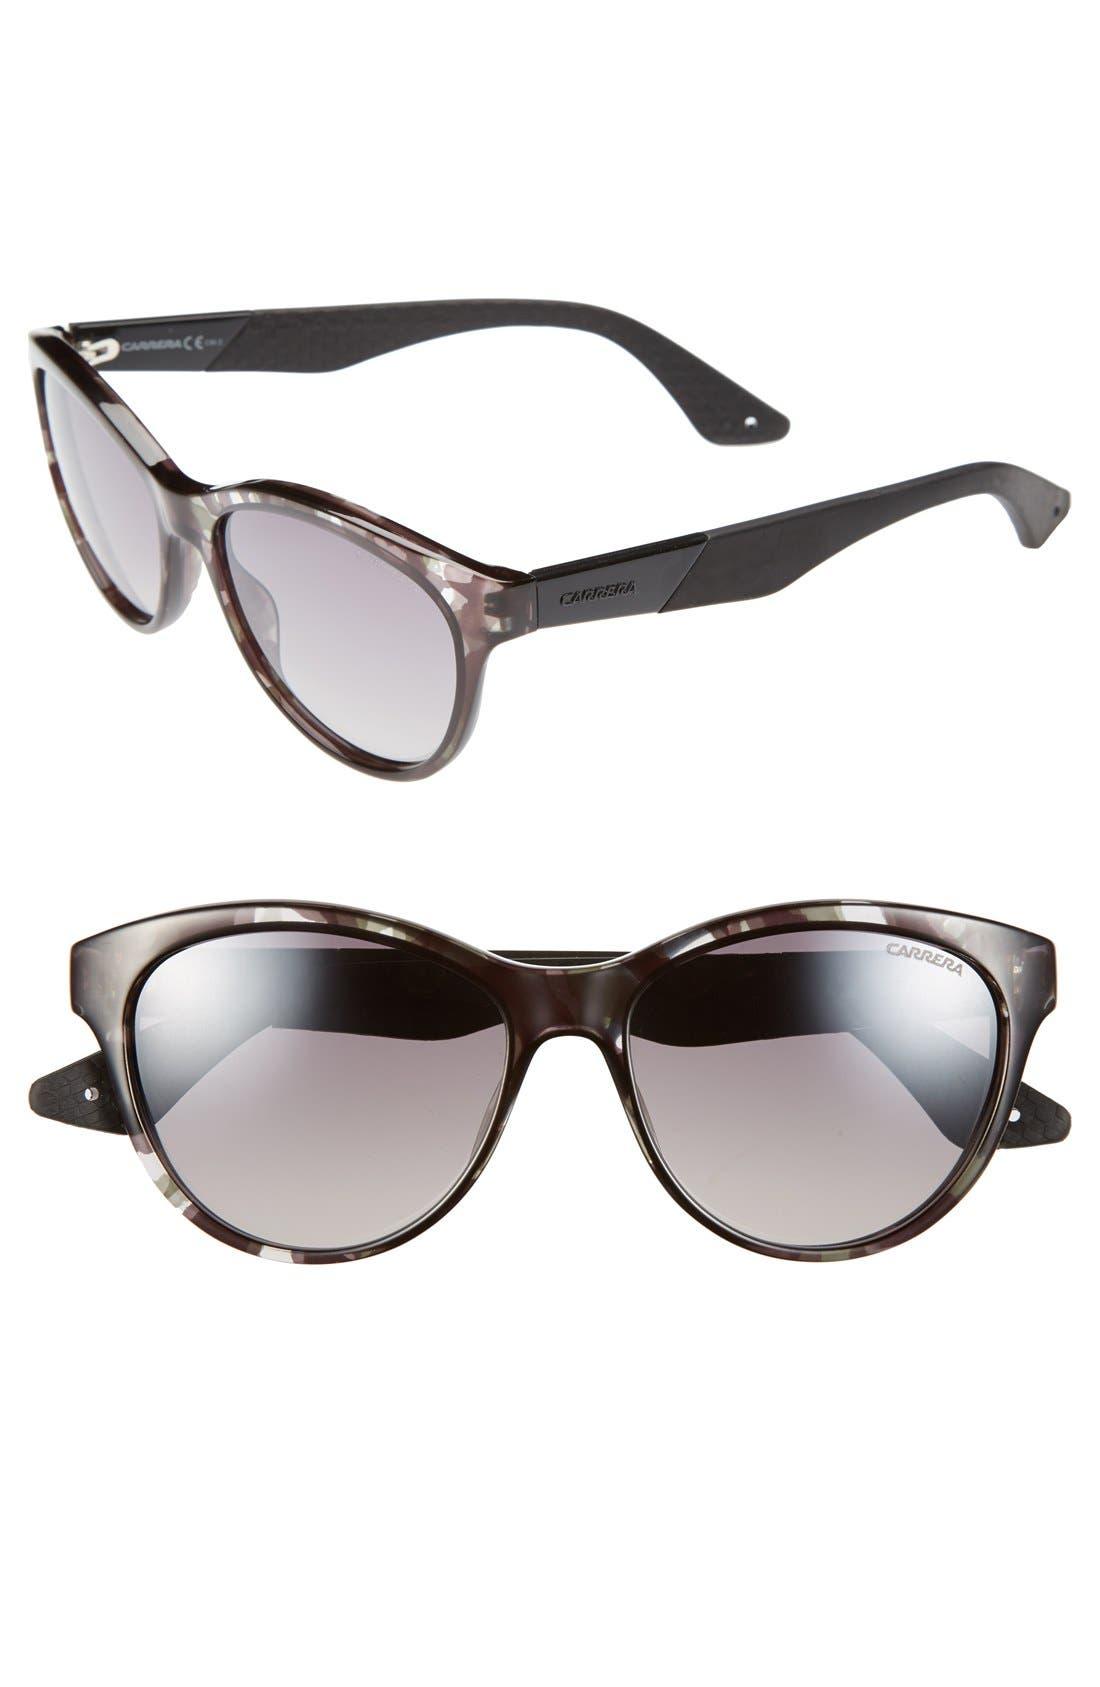 Main Image - Carrera Eyewear 54mm Retro Sunglasses